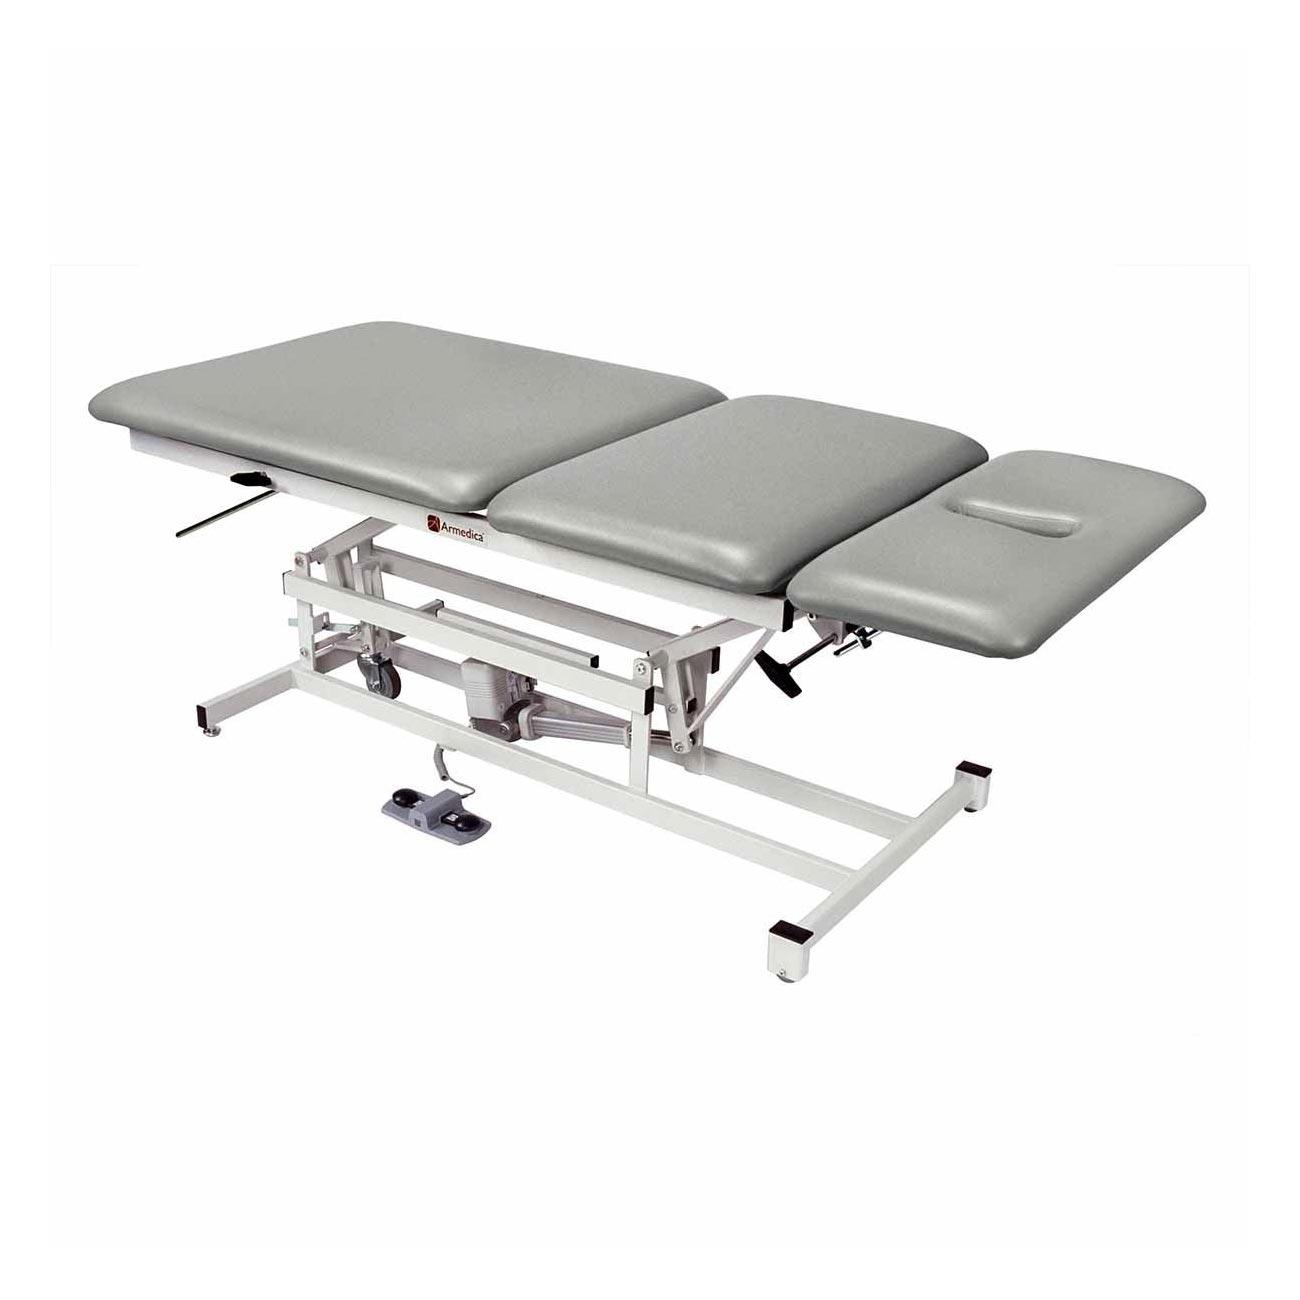 Armedica AM-BA 334 bariatric treatment table